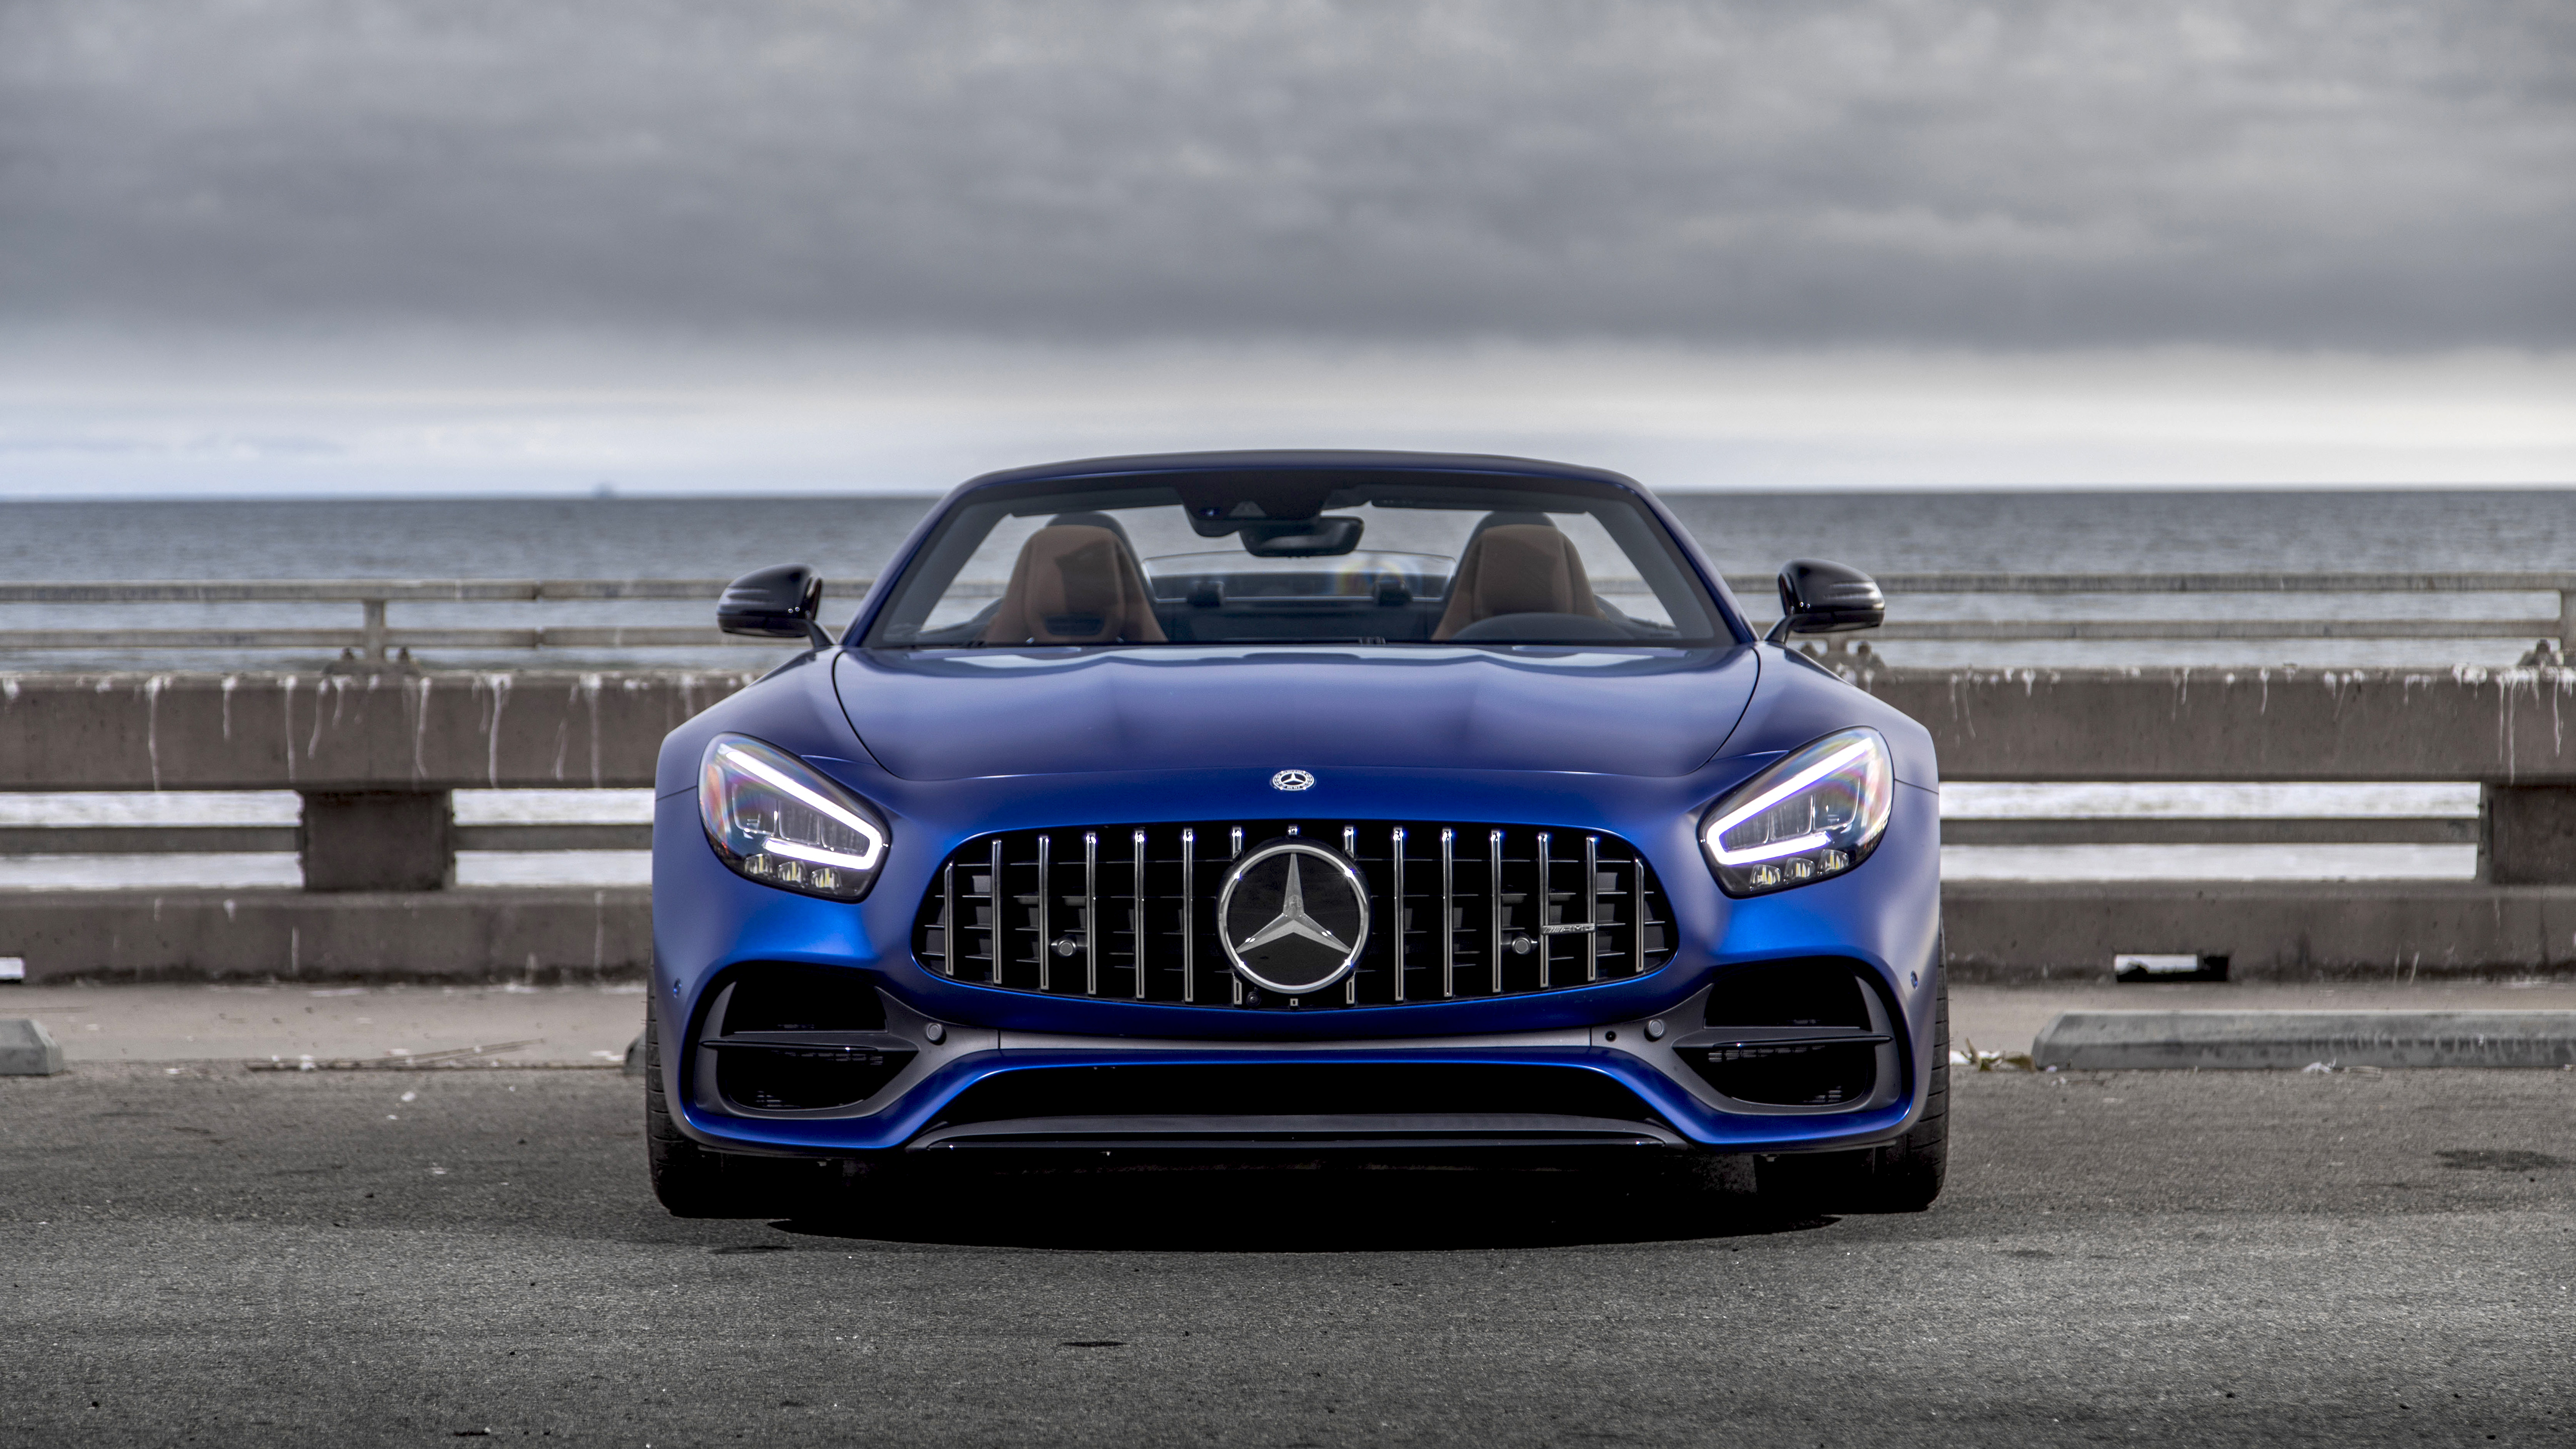 2020 Mercedes Amg Gt C Roadster 4k Wallpaper Hd Car Wallpapers Id 12821